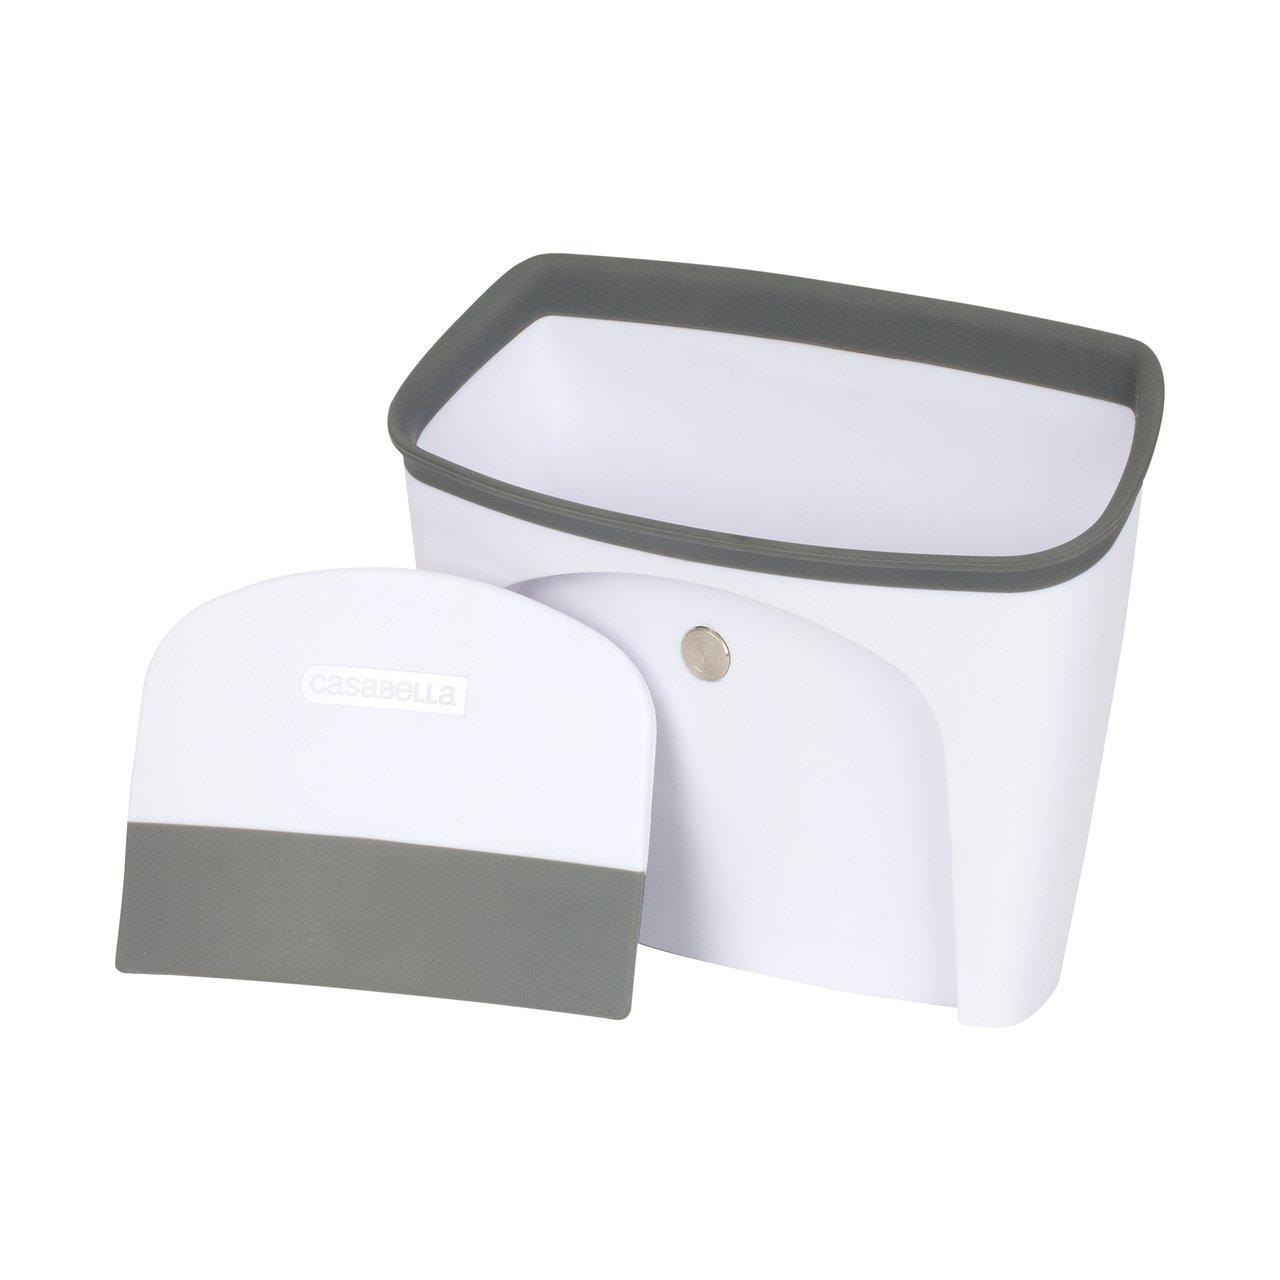 Casabella Countertop Dustpan 50042